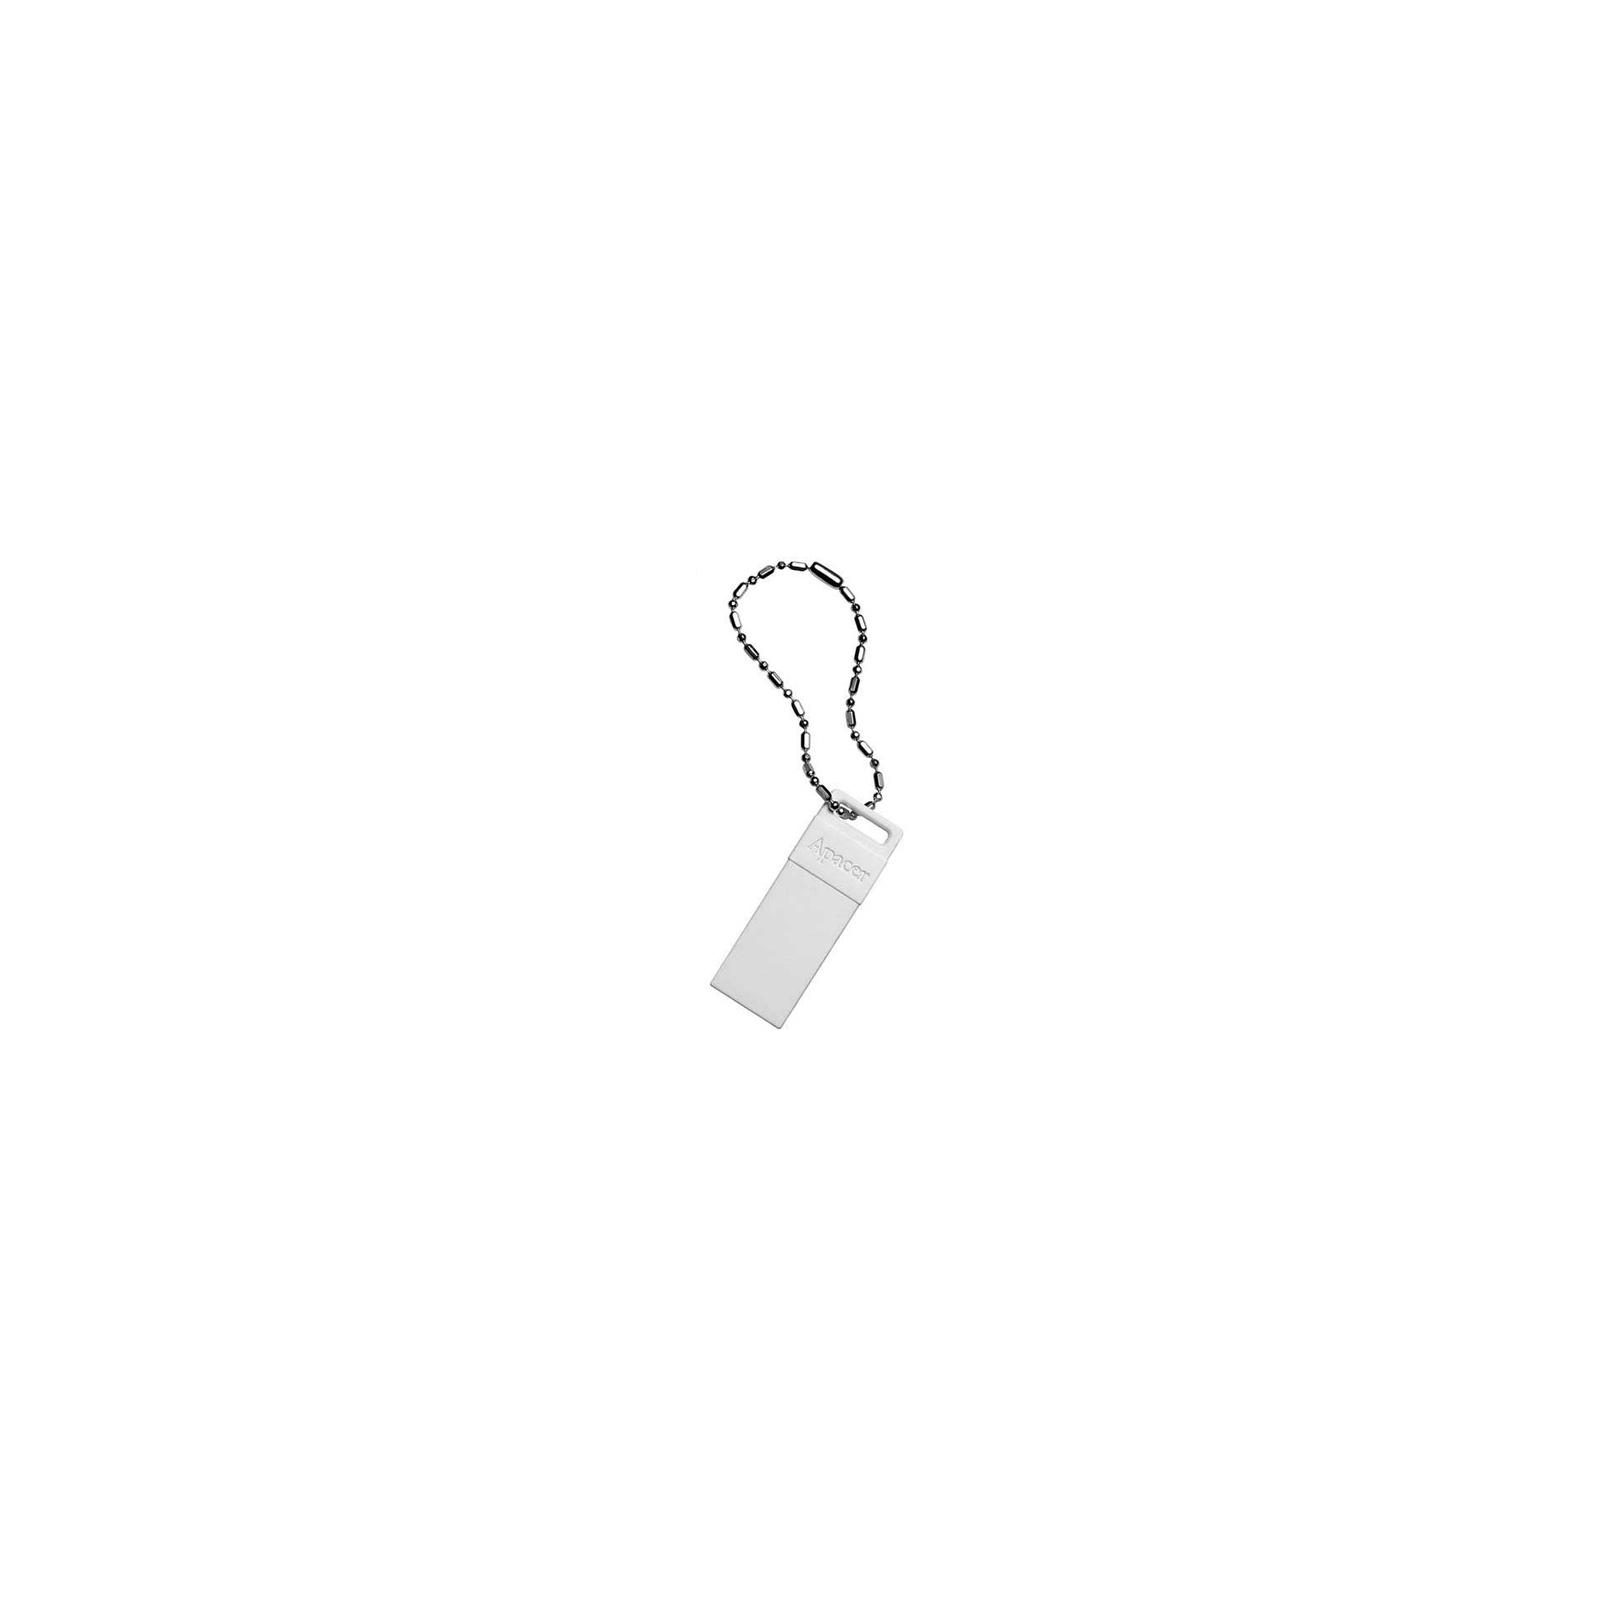 USB флеш накопитель 8GB AH110 White RP USB2.0 Apacer (AP8GAH110W-1) изображение 2